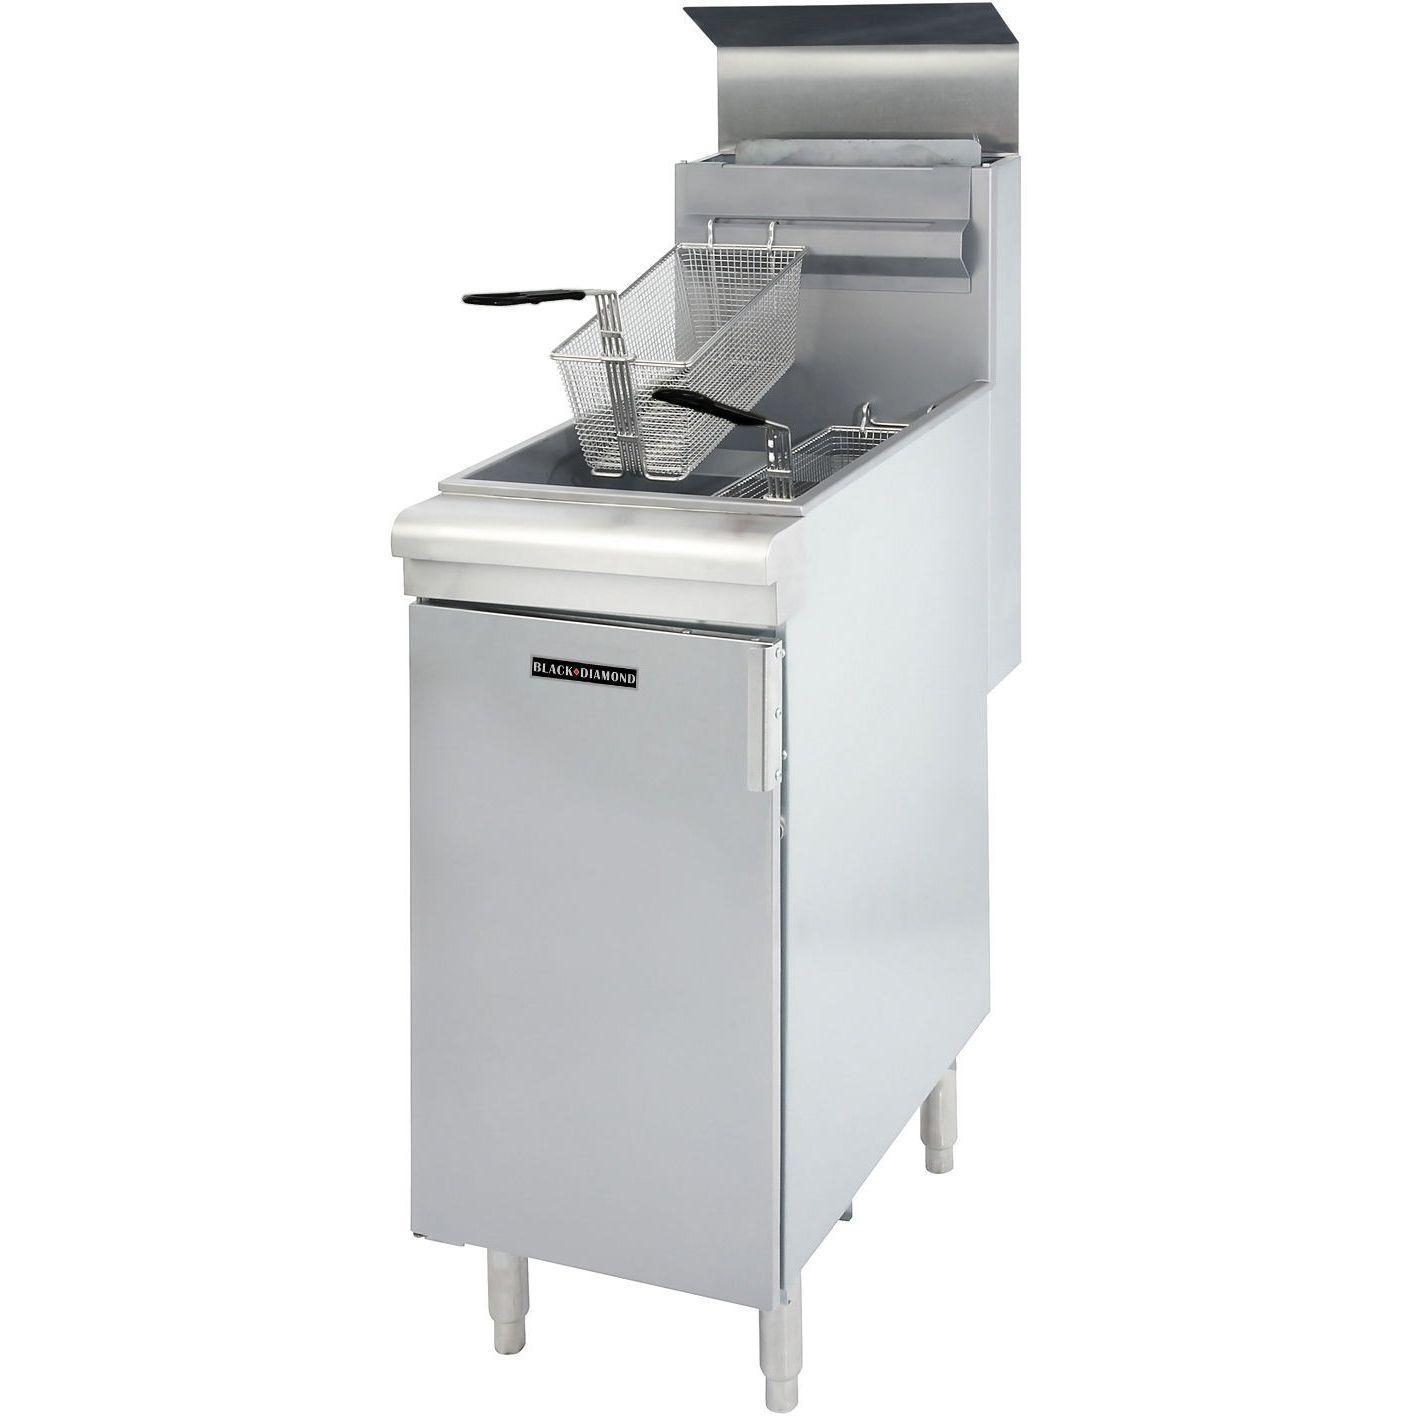 Commercial Kitchen Stainless Steel 45 50 Lb Deep Fryer 120 000 Btu